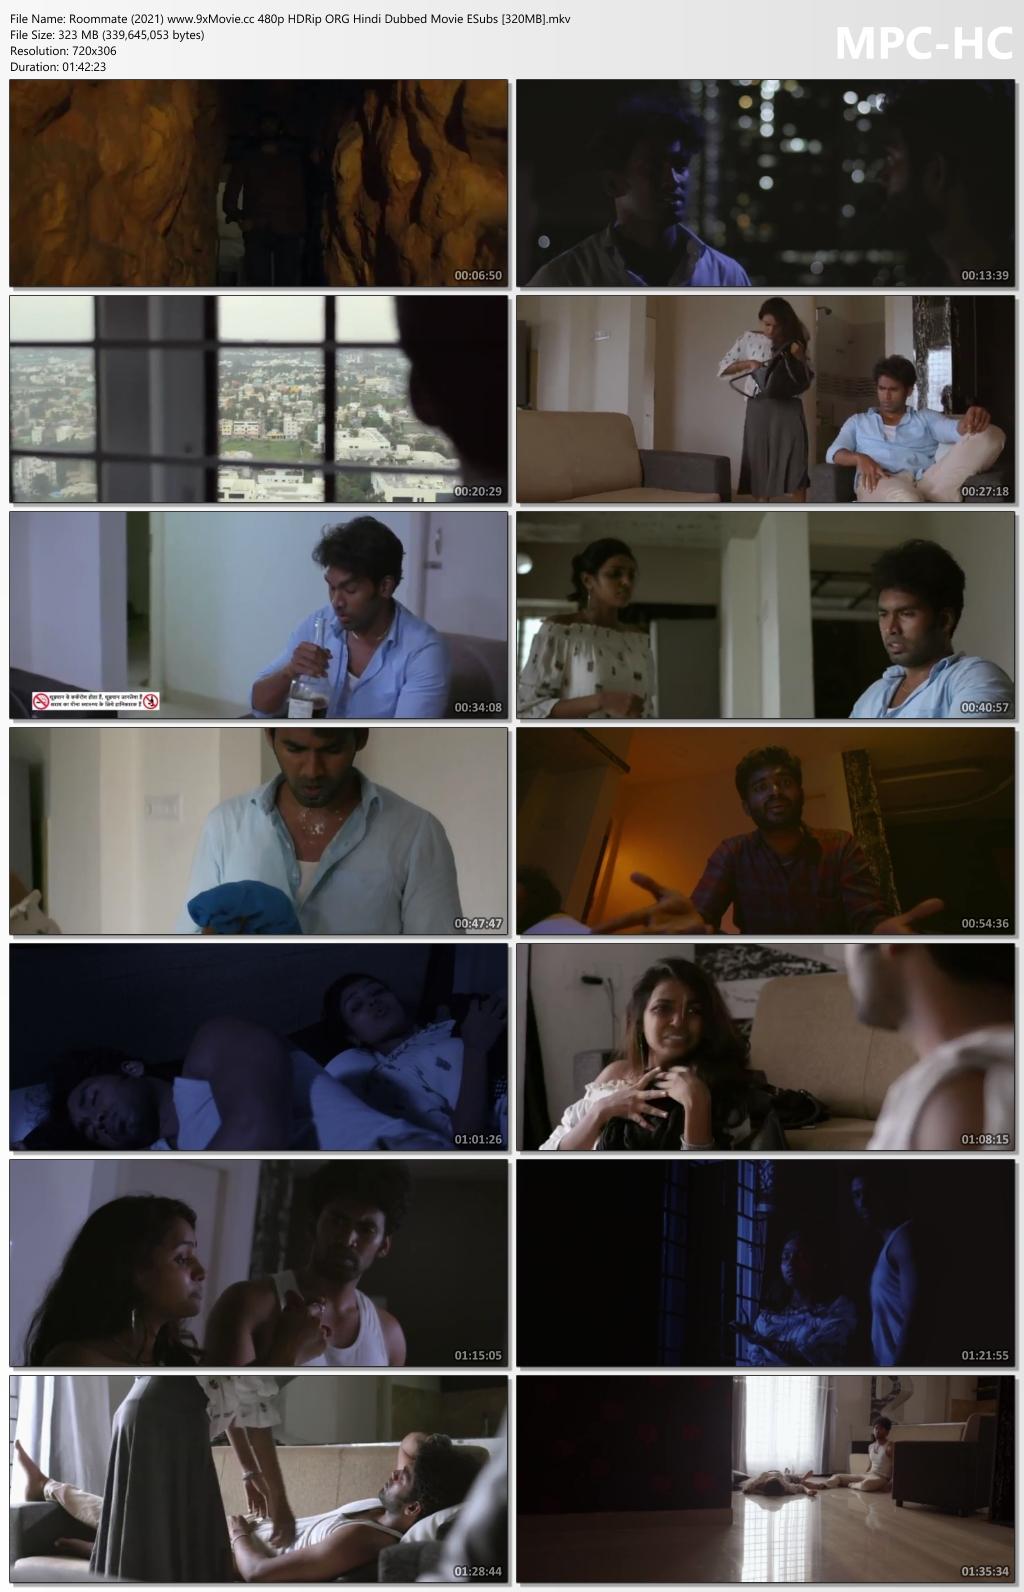 Roommate-2021-www-9x-Movie-cc-480p-HDRip-ORG-Hindi-Dubbed-Movie-ESubs-320-MB-mkv